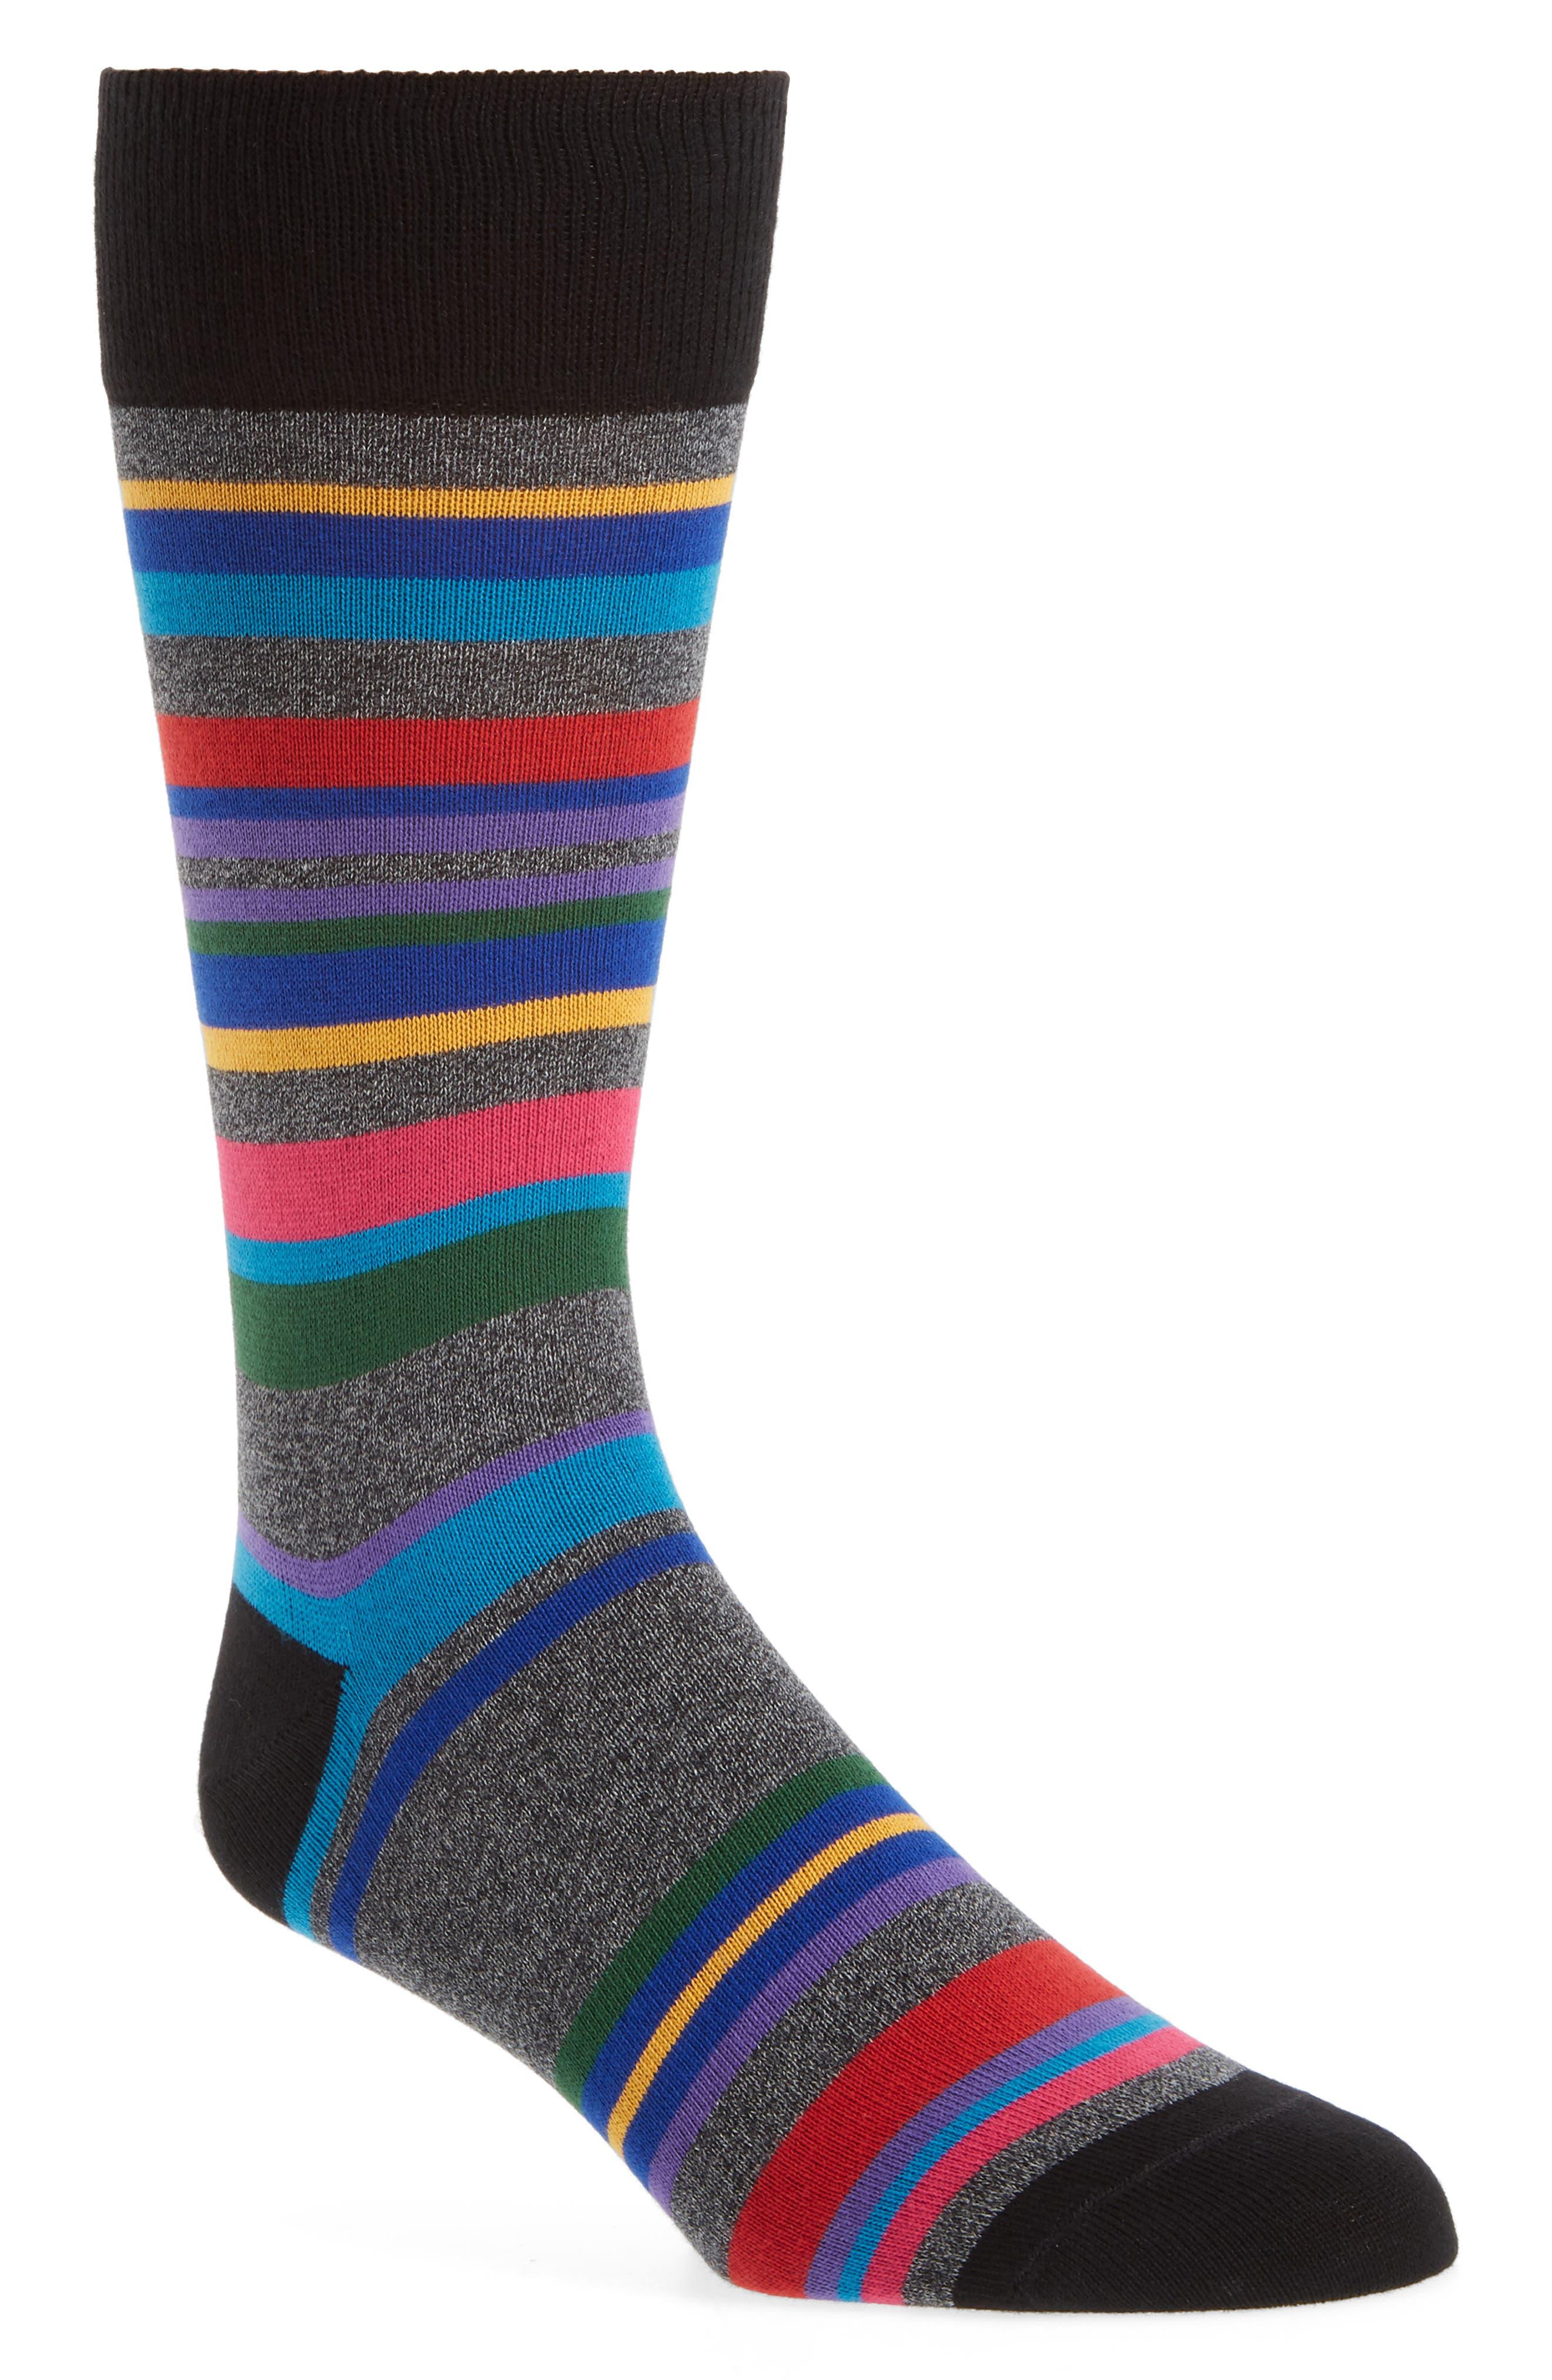 Aster Stripe Socks,                             Main thumbnail 1, color,                             001